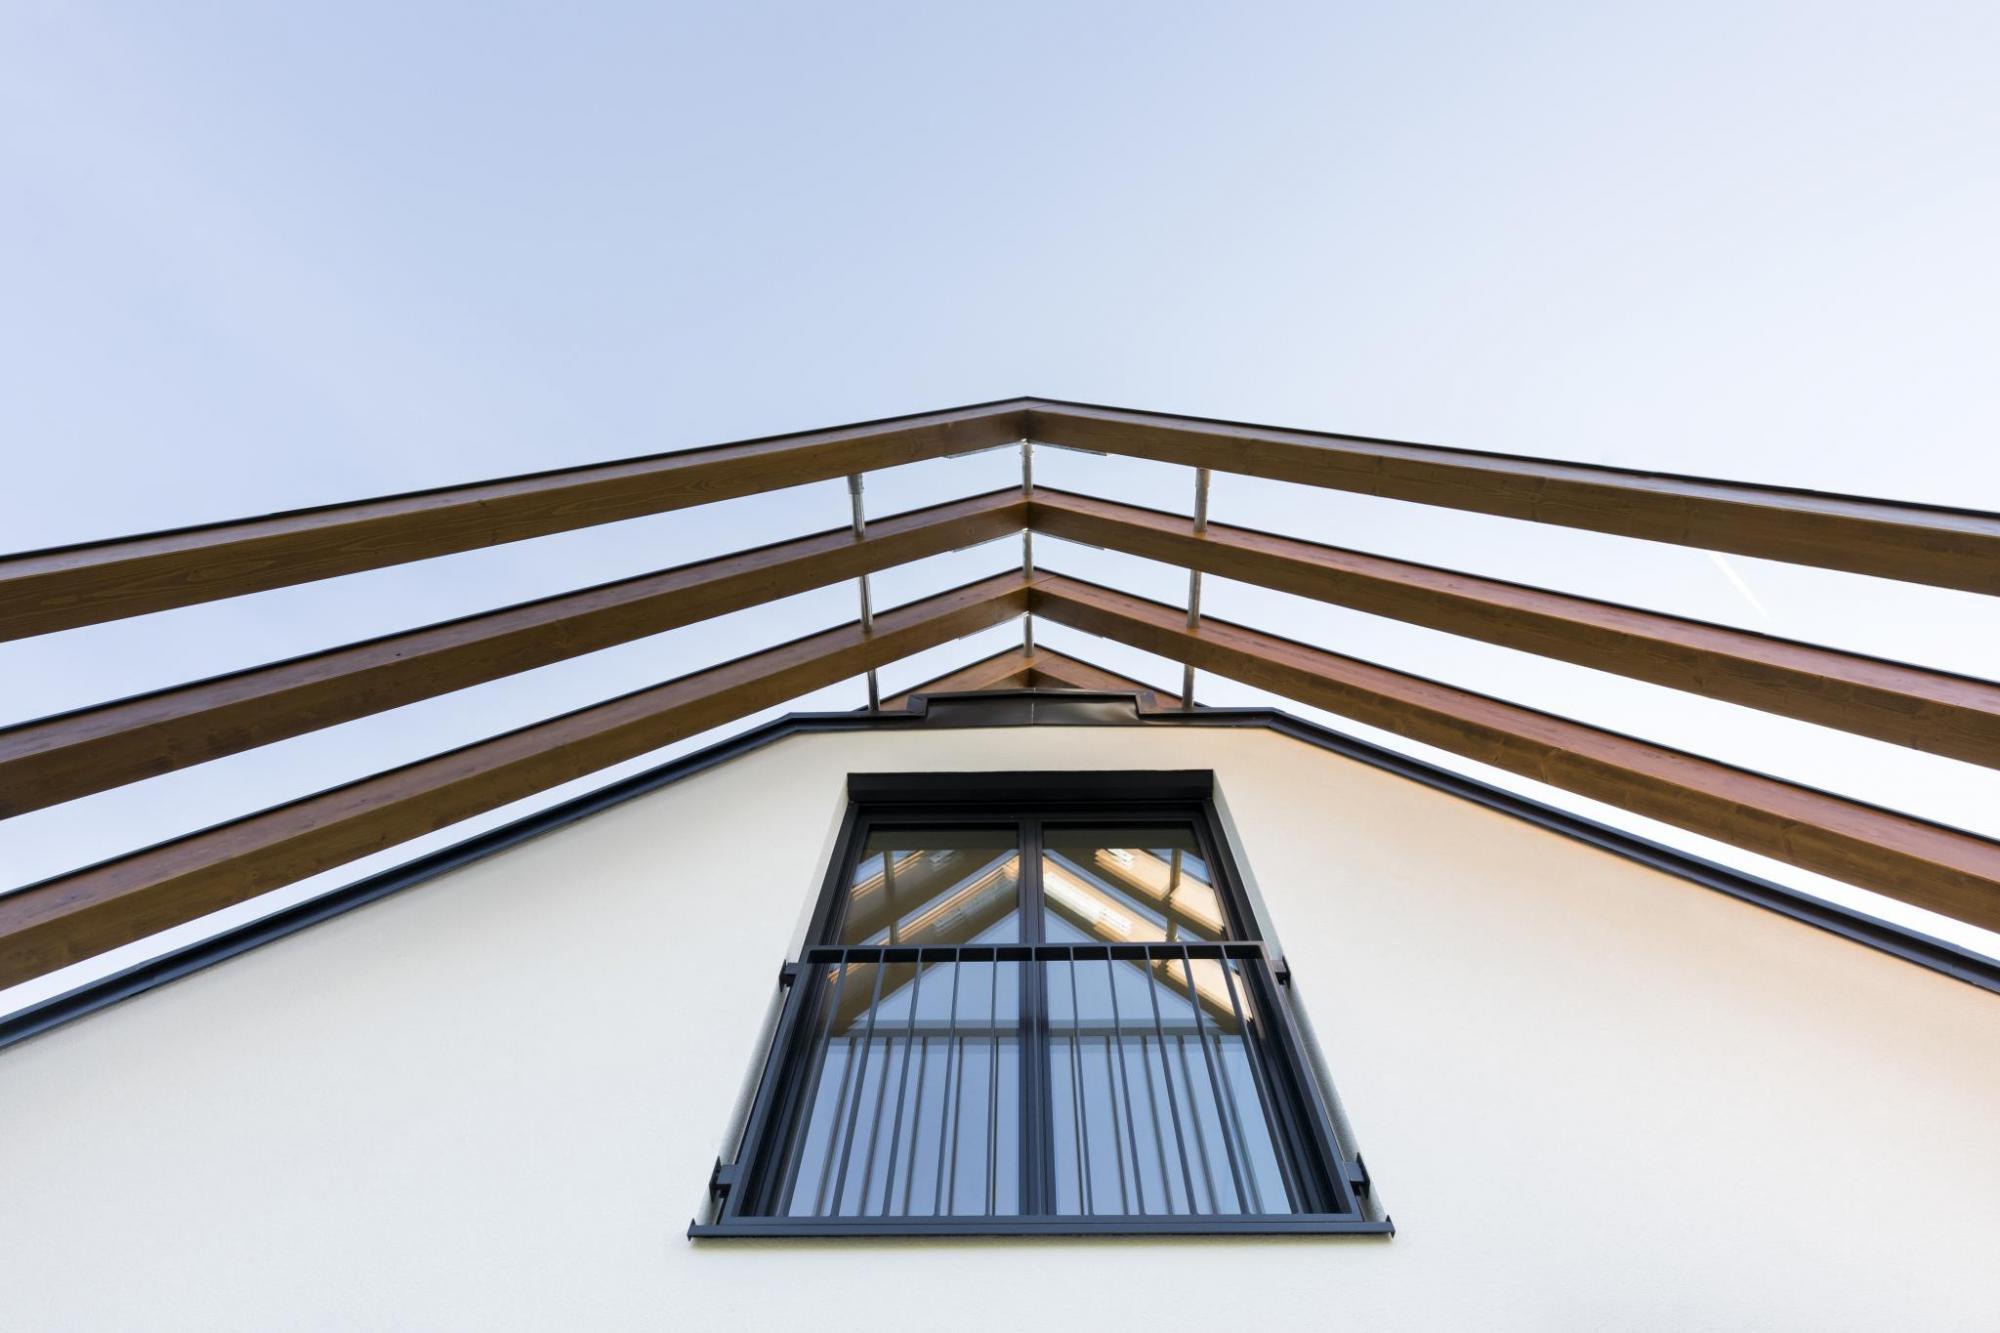 Neubau, Umbau & Zubau, Sanierungen, Dachgeschossausbau, Fassaden oder Denkmalschutz